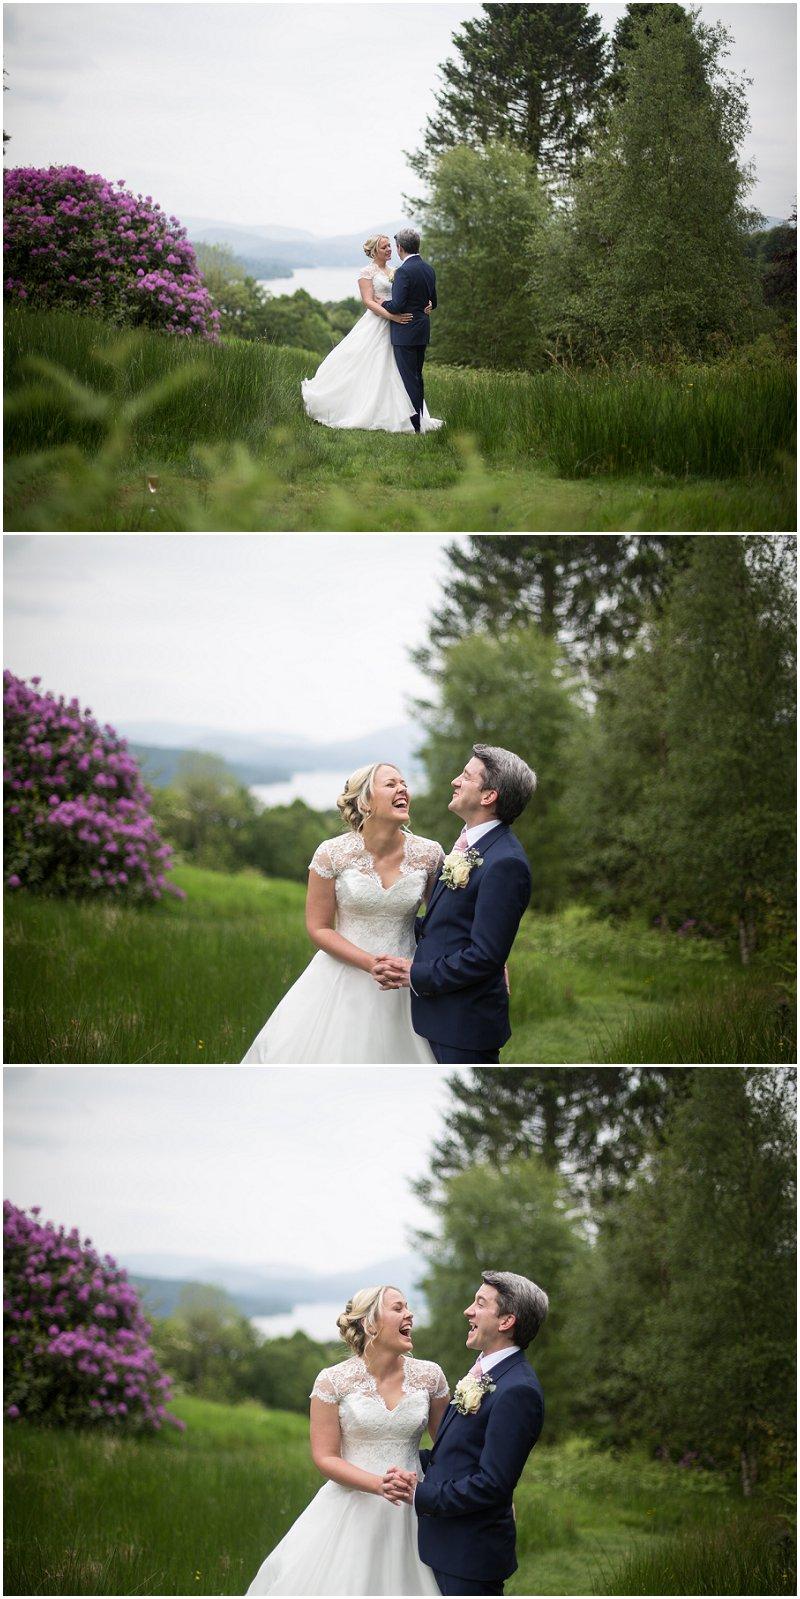 Beautiful portraits at Linthwaite House Wedding Photography